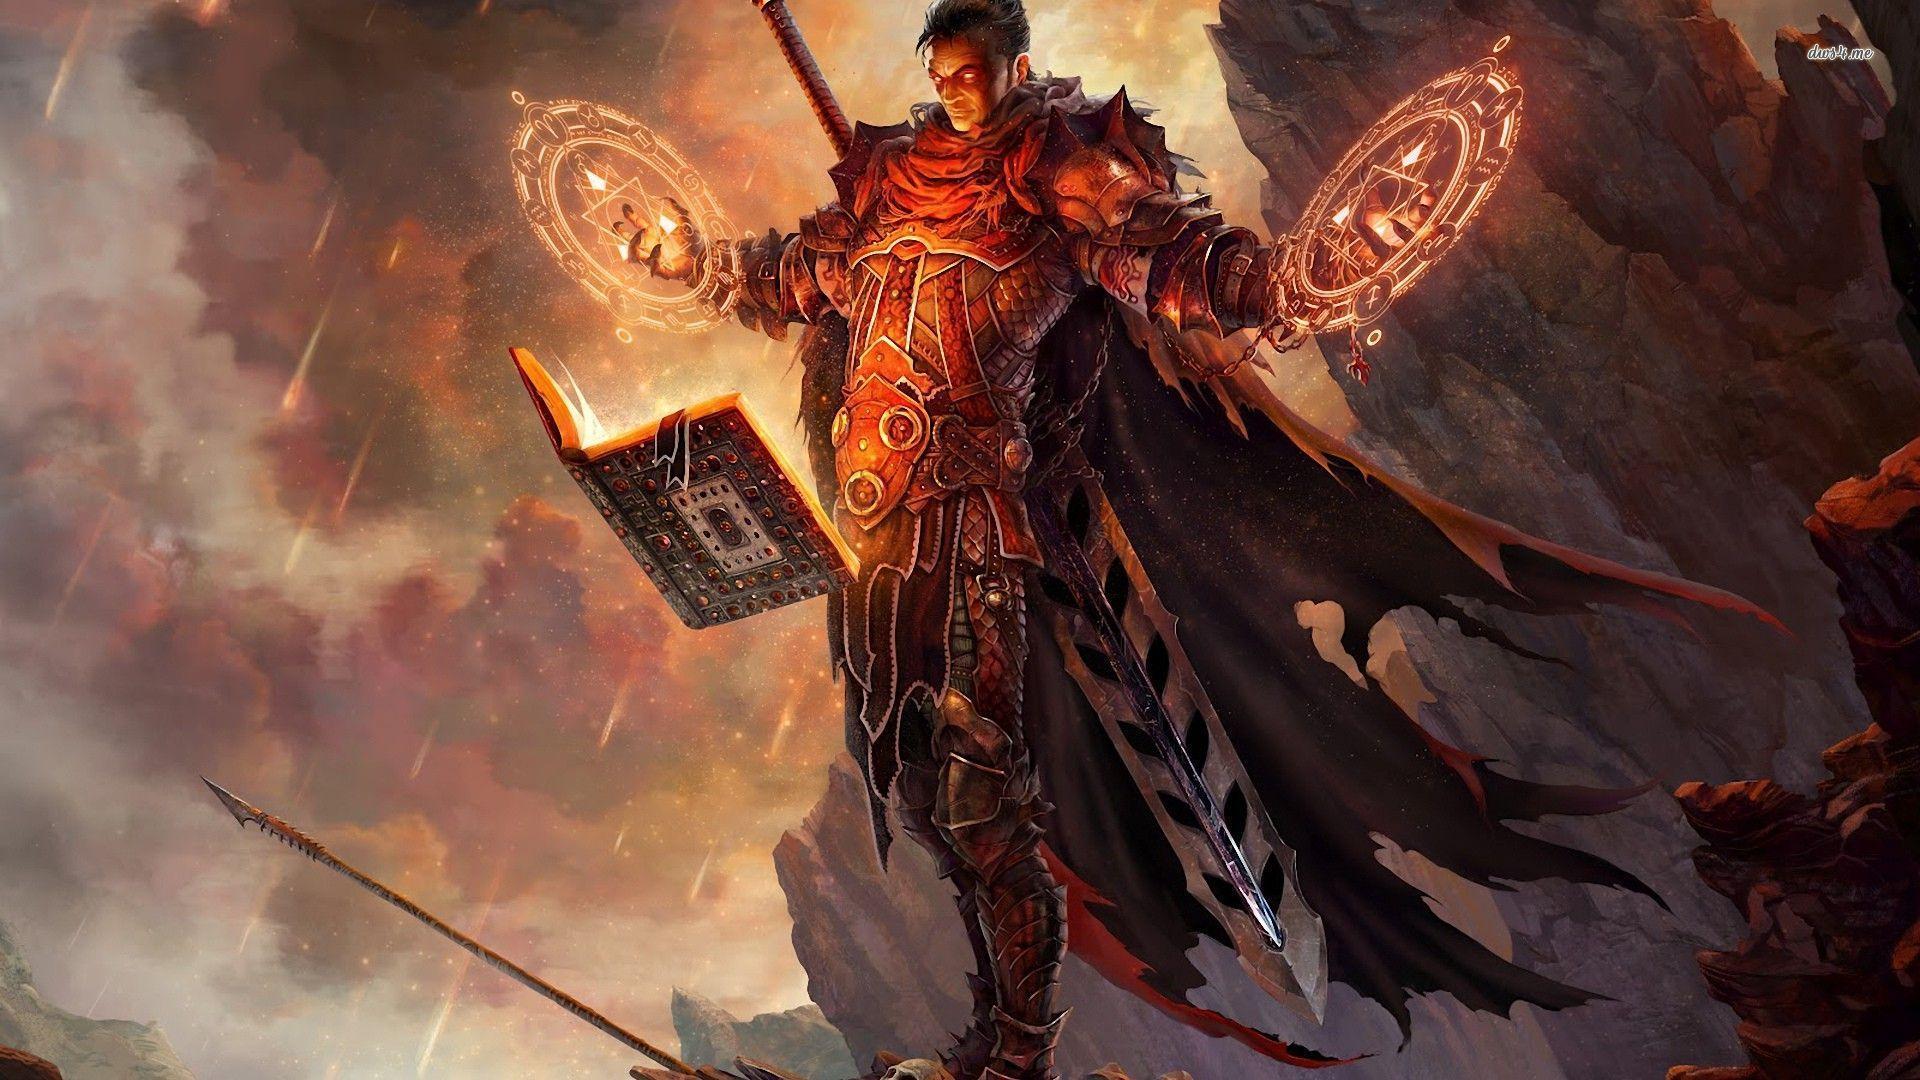 Mage Warrior Wallpaper Warriors Wallpaper Mage Dark Fantasy Art